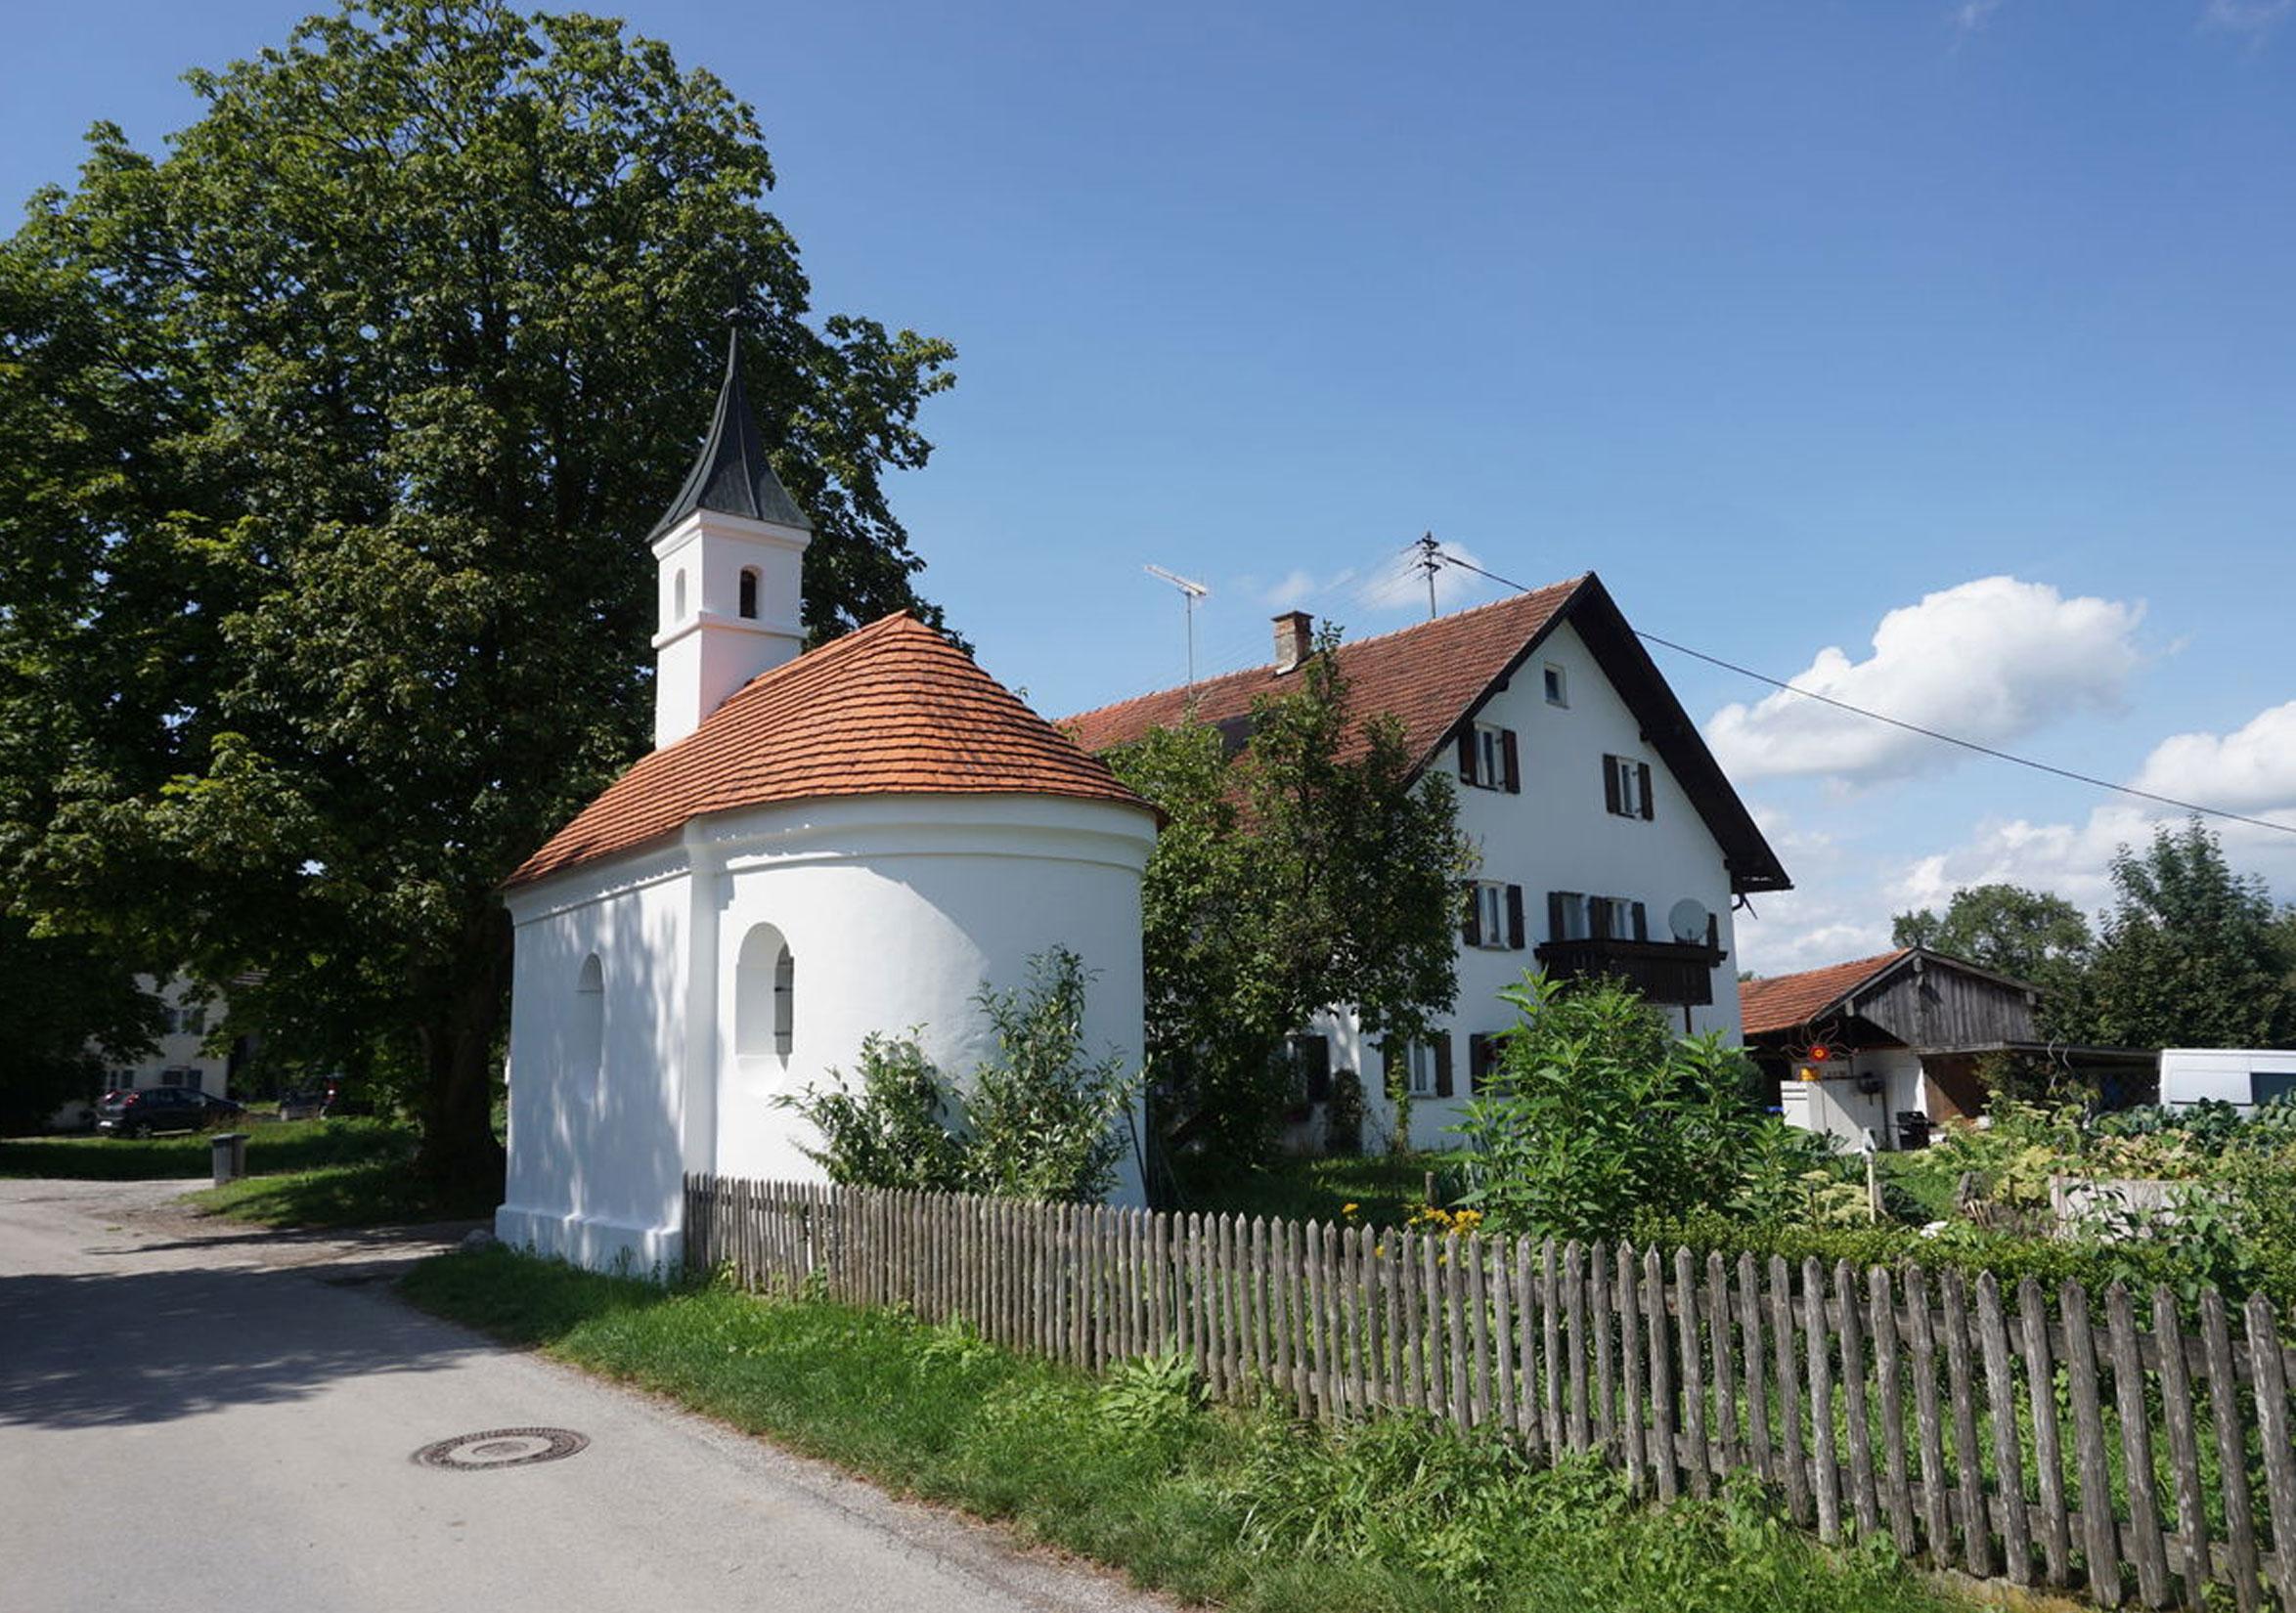 Kapelle in Rausch